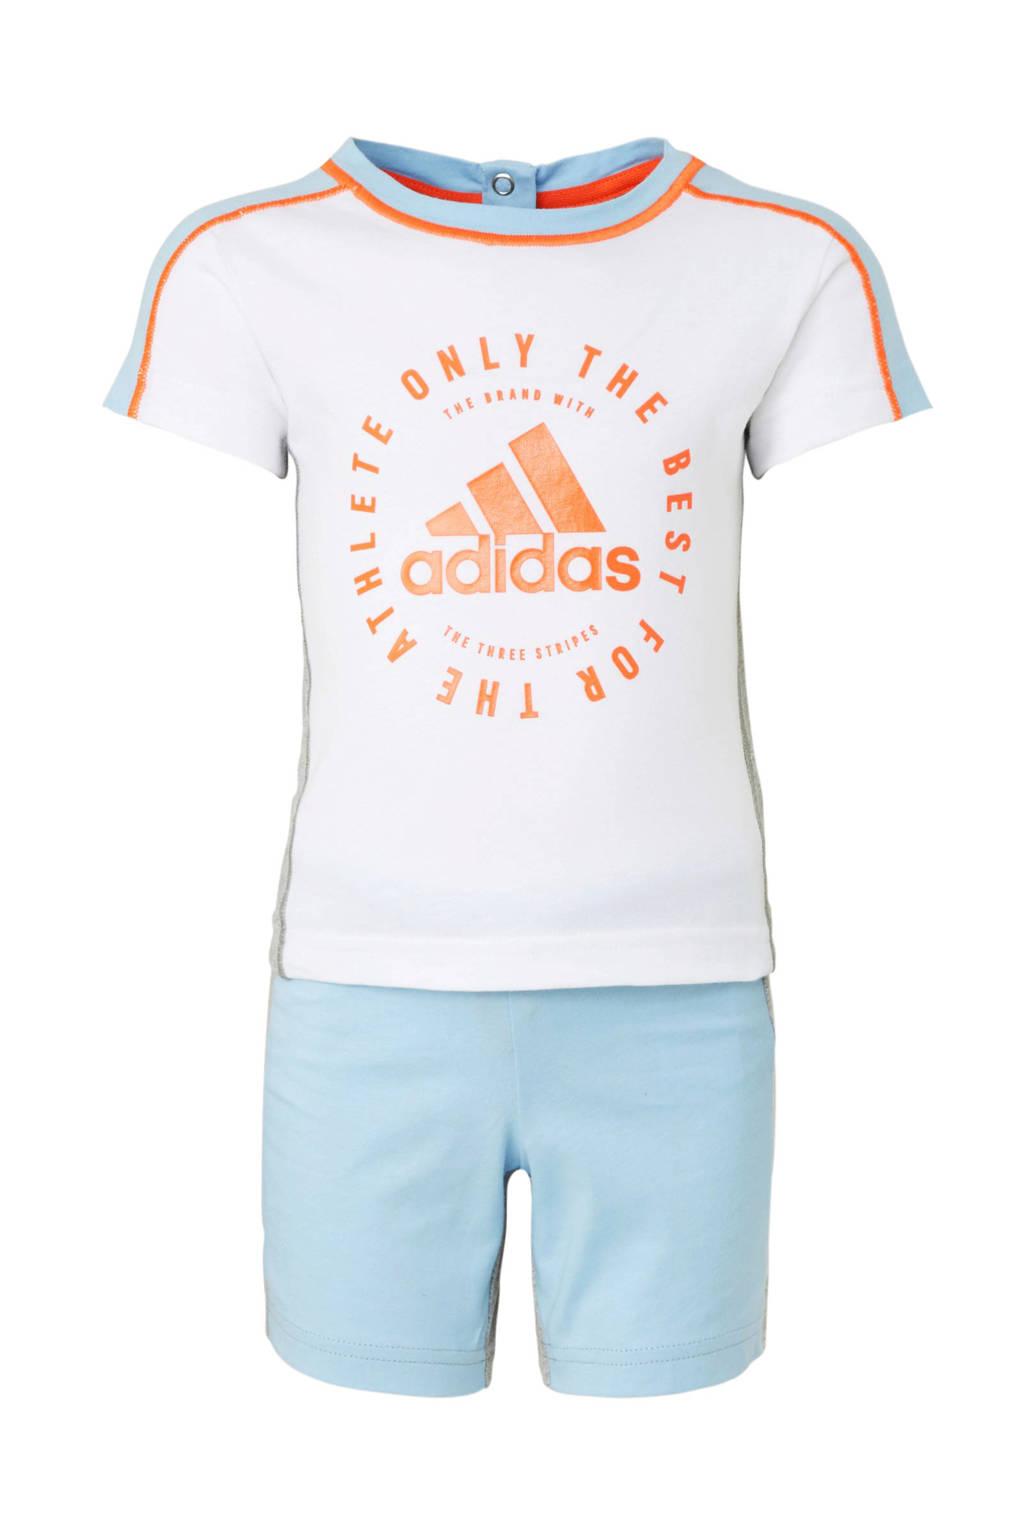 adidas performance   trainingspak wit/blauw/grijs/oranje, Wit/blauw/grijs/oranje